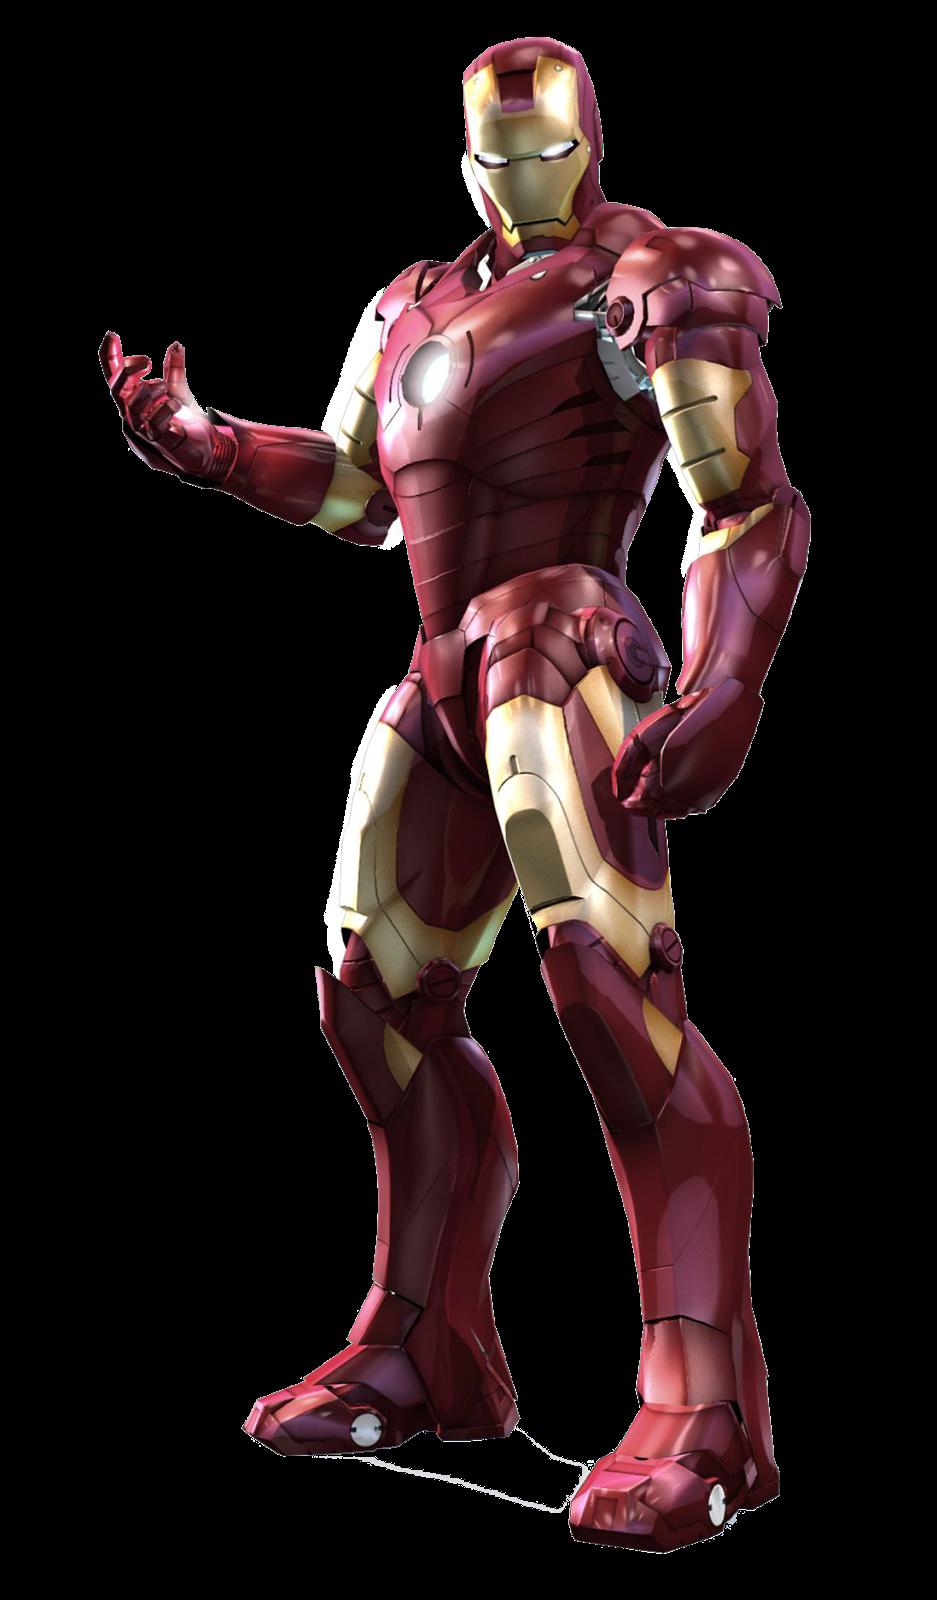 My Heroe Comic: IRONMAN